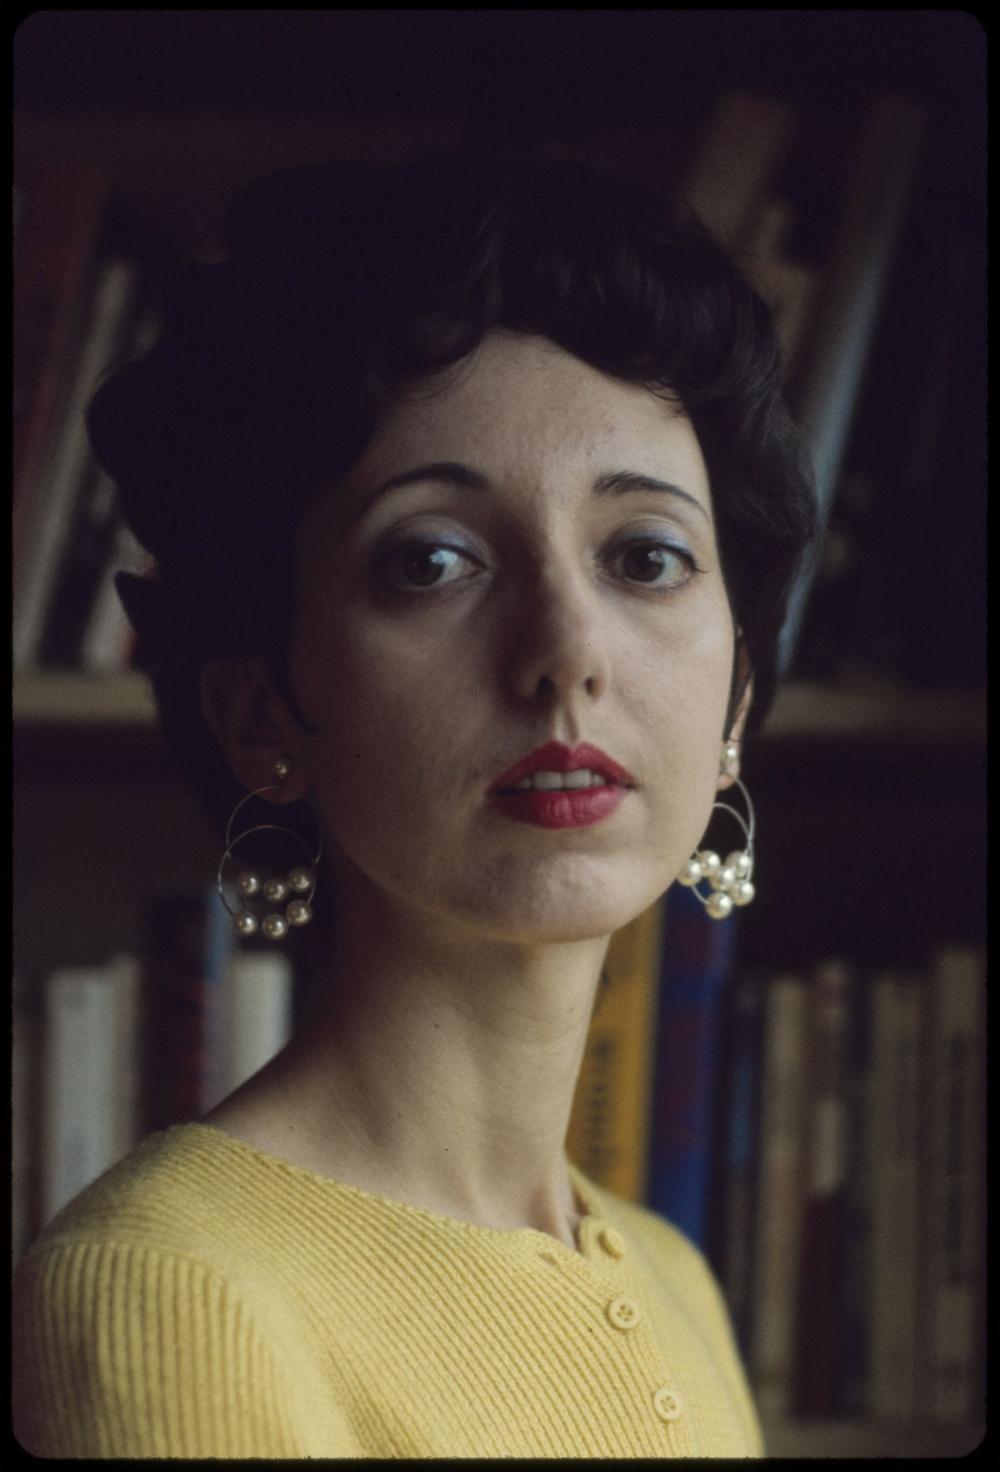 Joyce Carol Oates. Library of Congress, Prints & Photographs Division, photograph by Bernard Gotfryd.